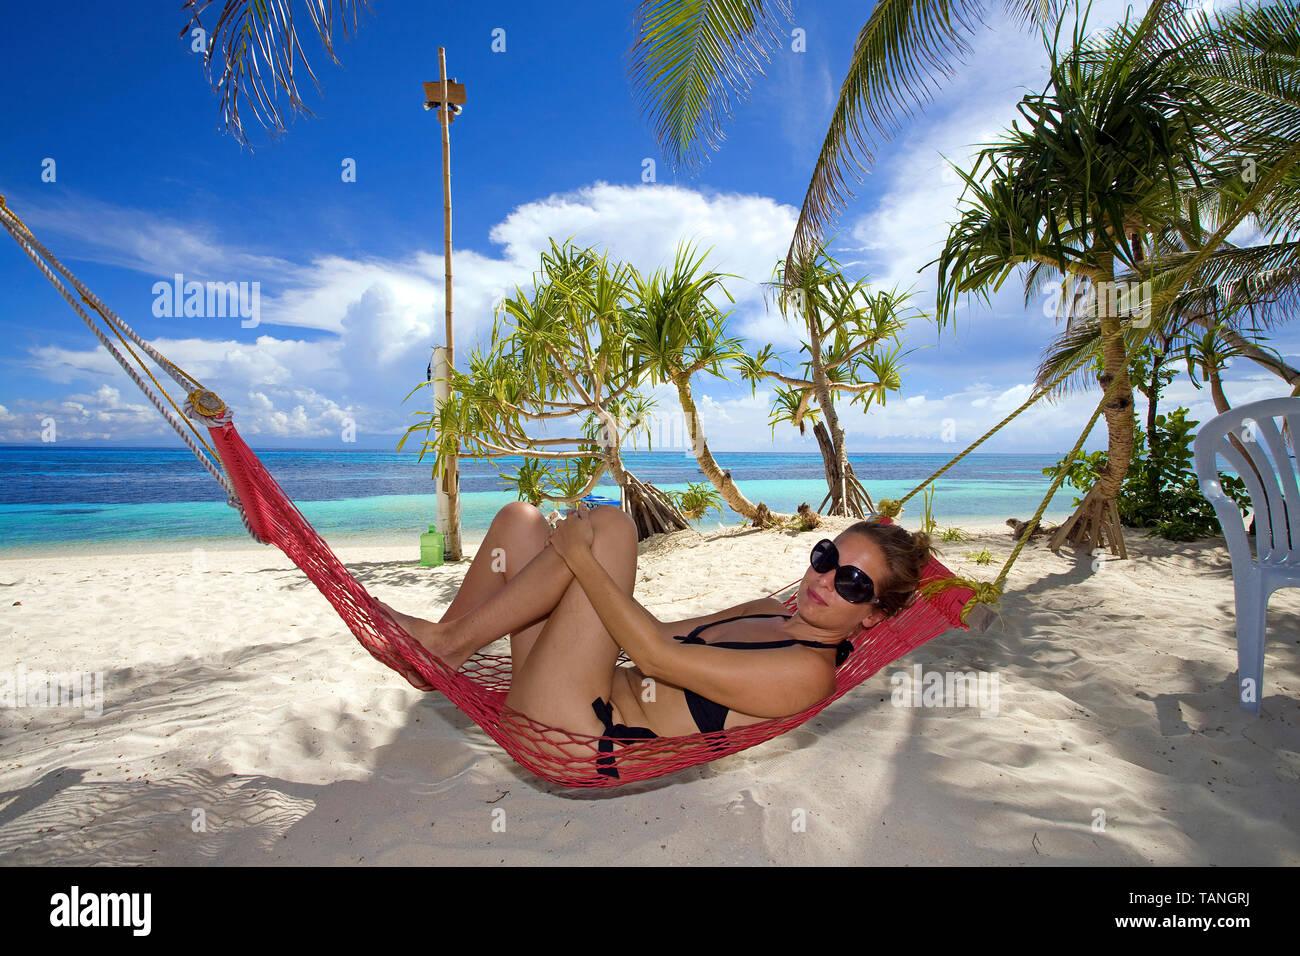 Girl relaxing on a hammock at Bounty beach, Malapascua island, Cebu, Philippines - Stock Image